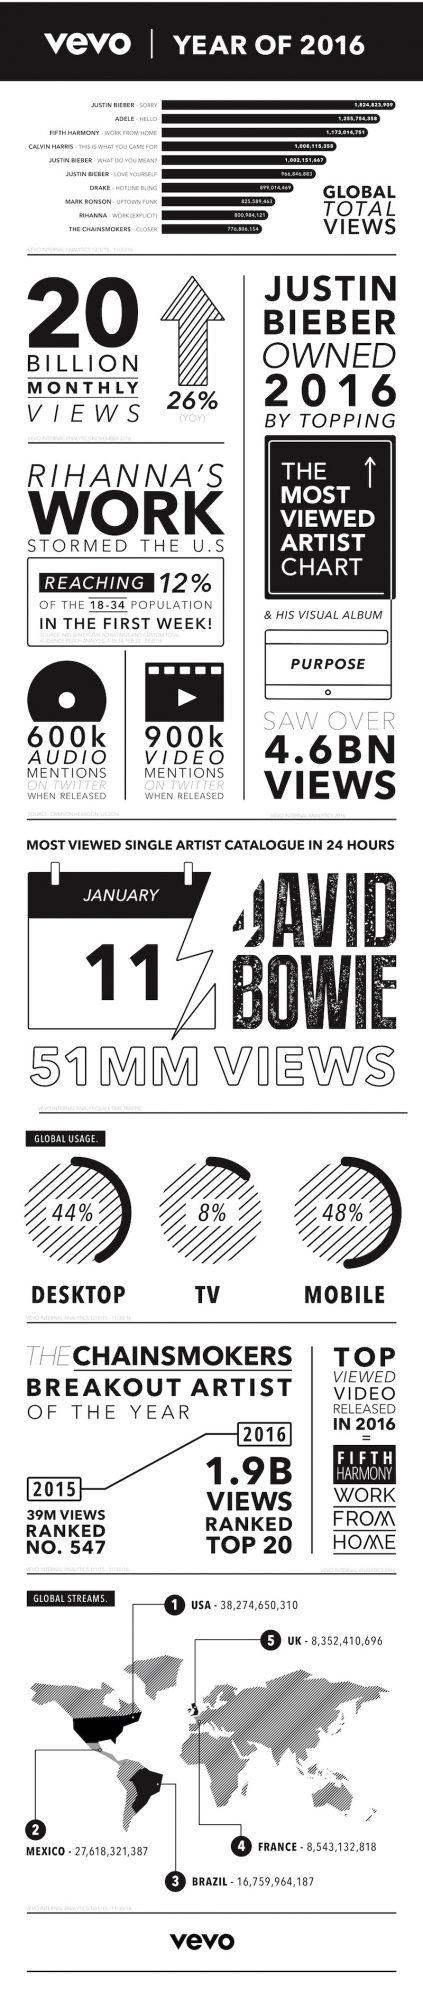 vevo-2016-infographic-large.jpg